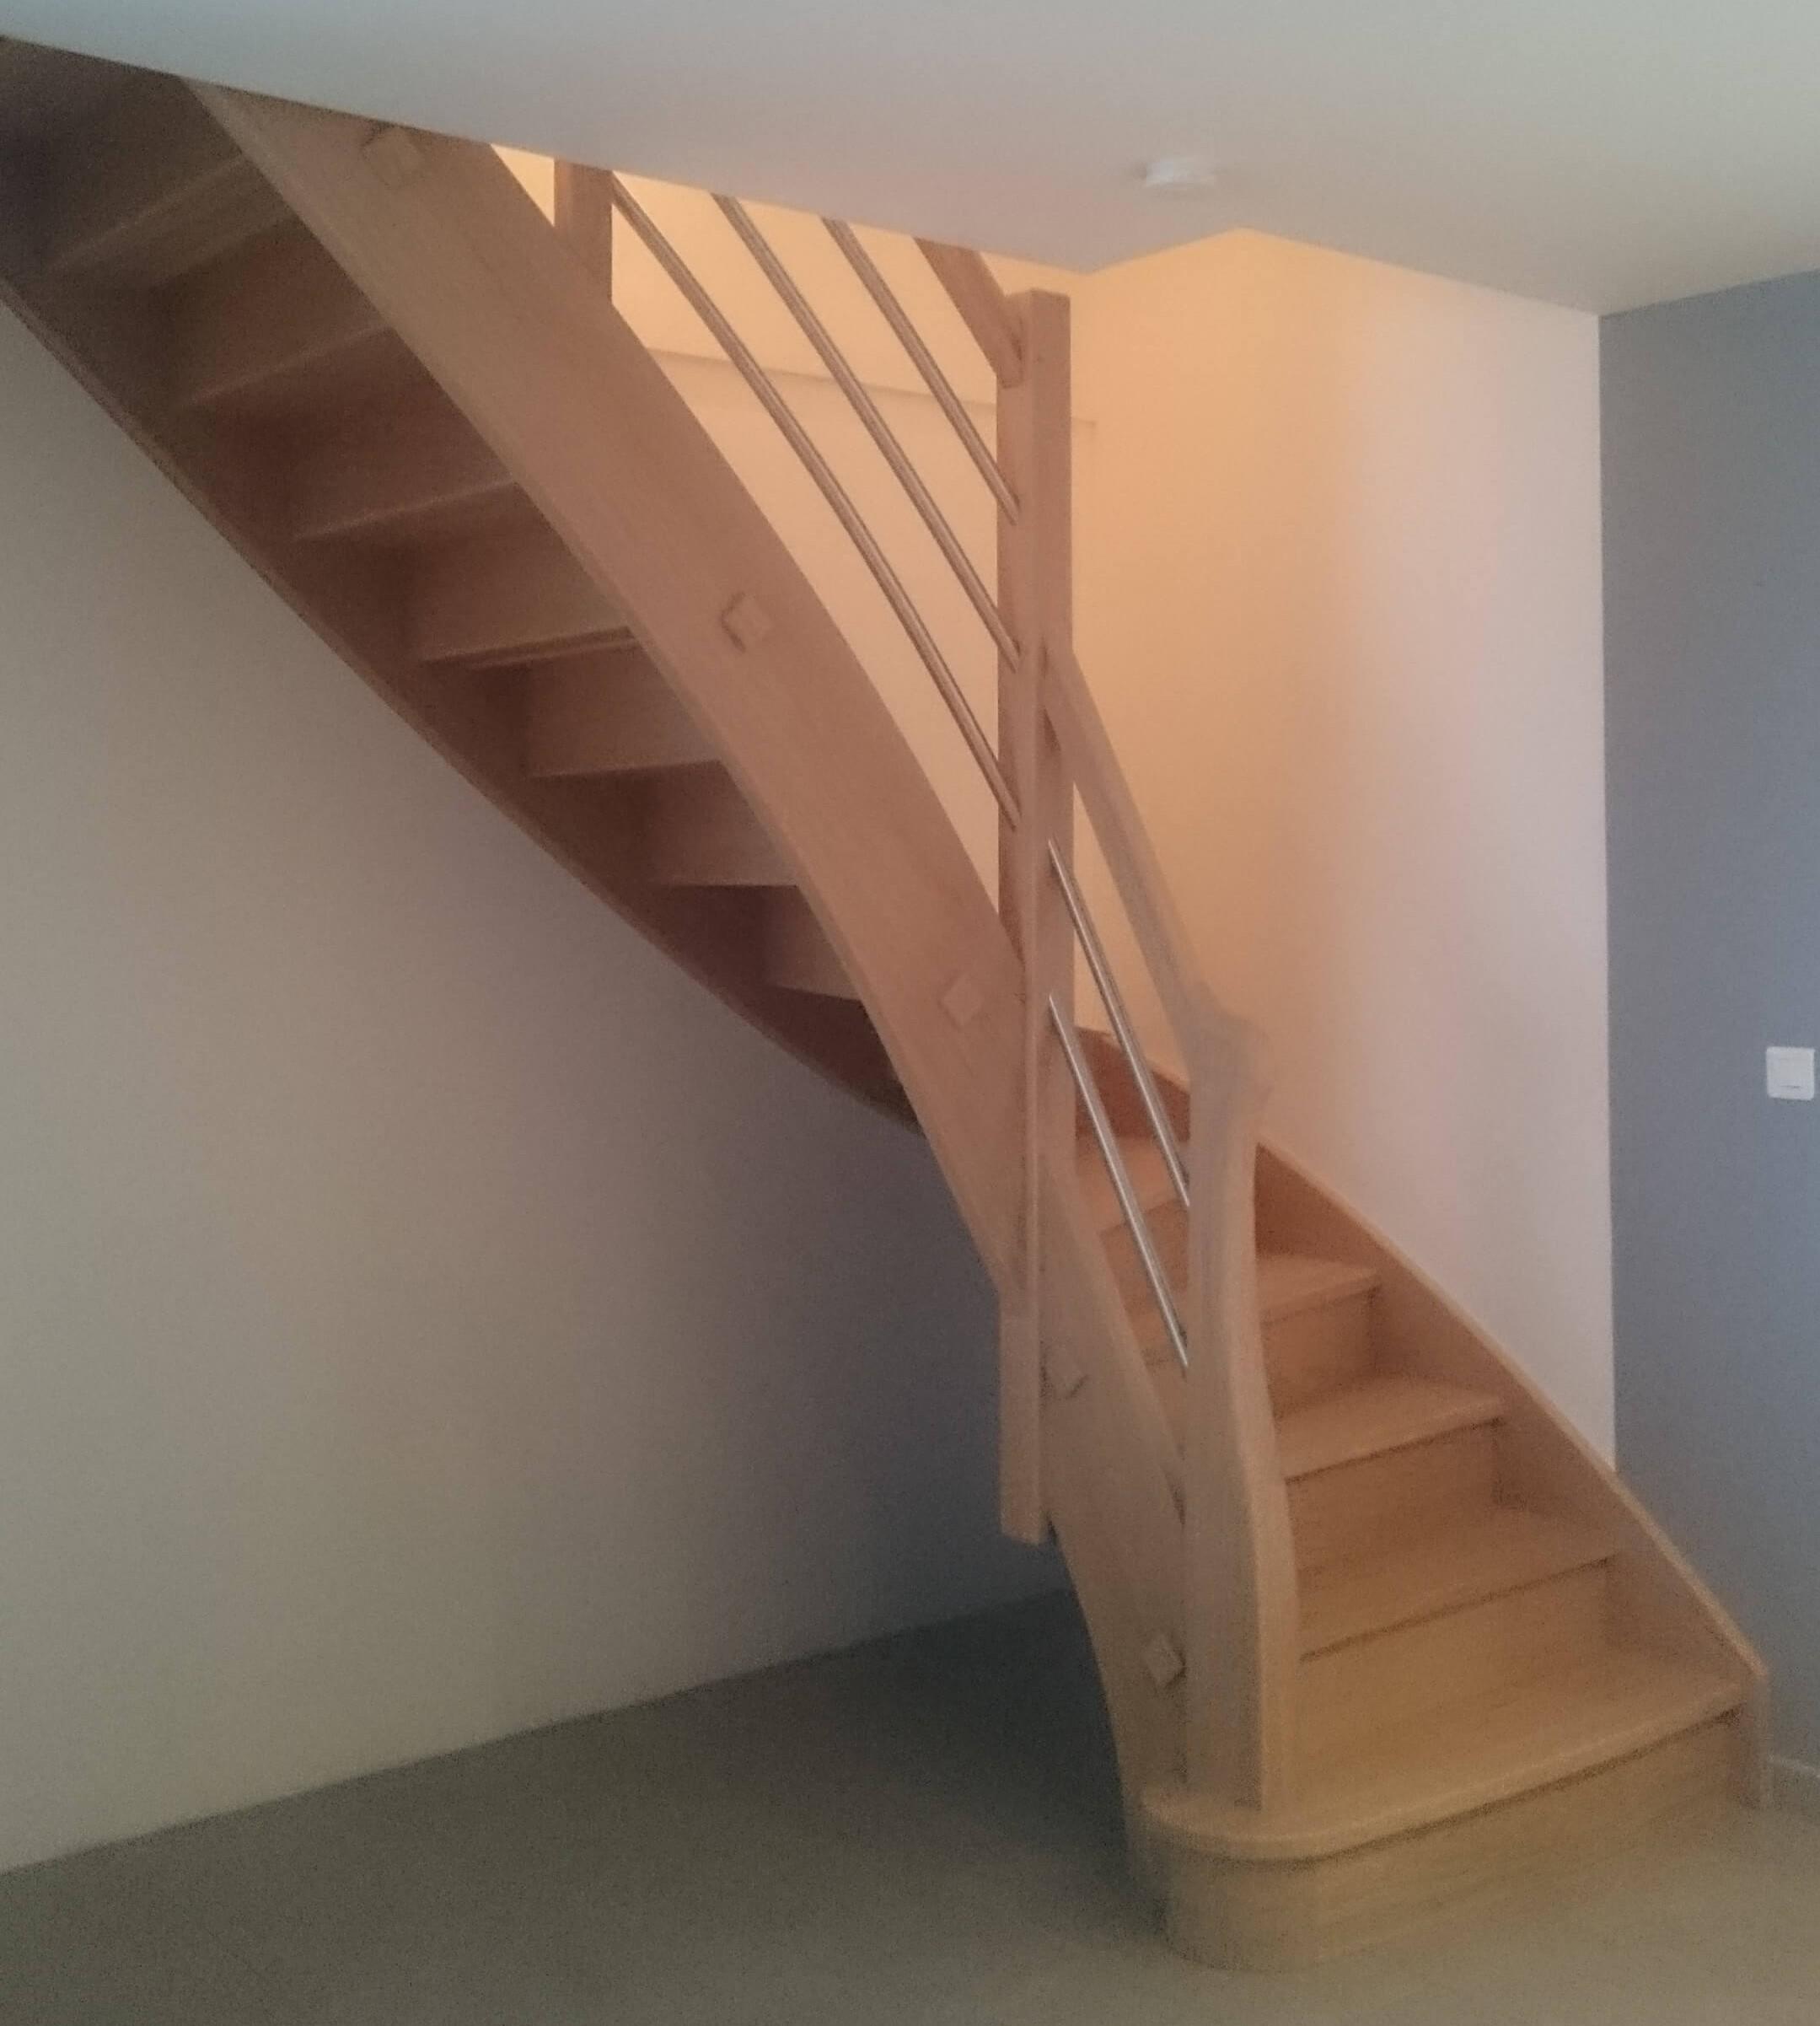 Menuiserie Figard - Fabrication sur mesure - Escalier 1/4 tournant - Chêne blanchi inox - Vesoul